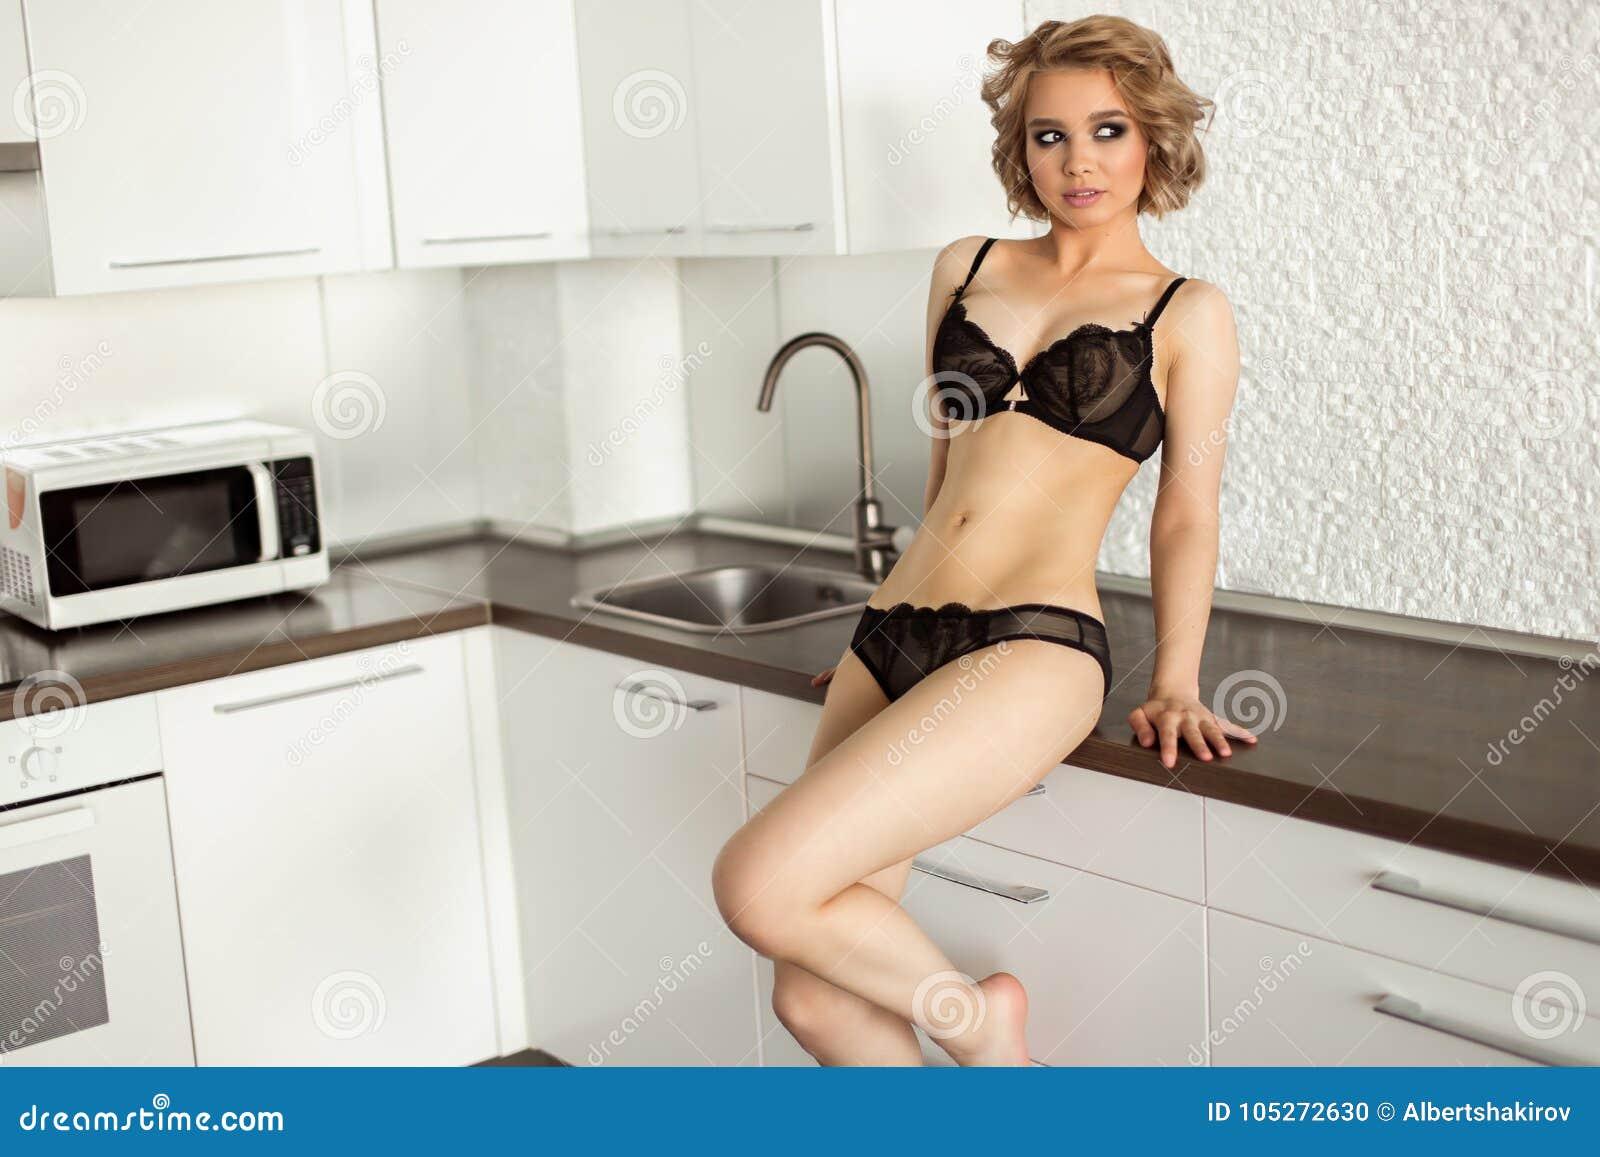 Lingerie in kitchen